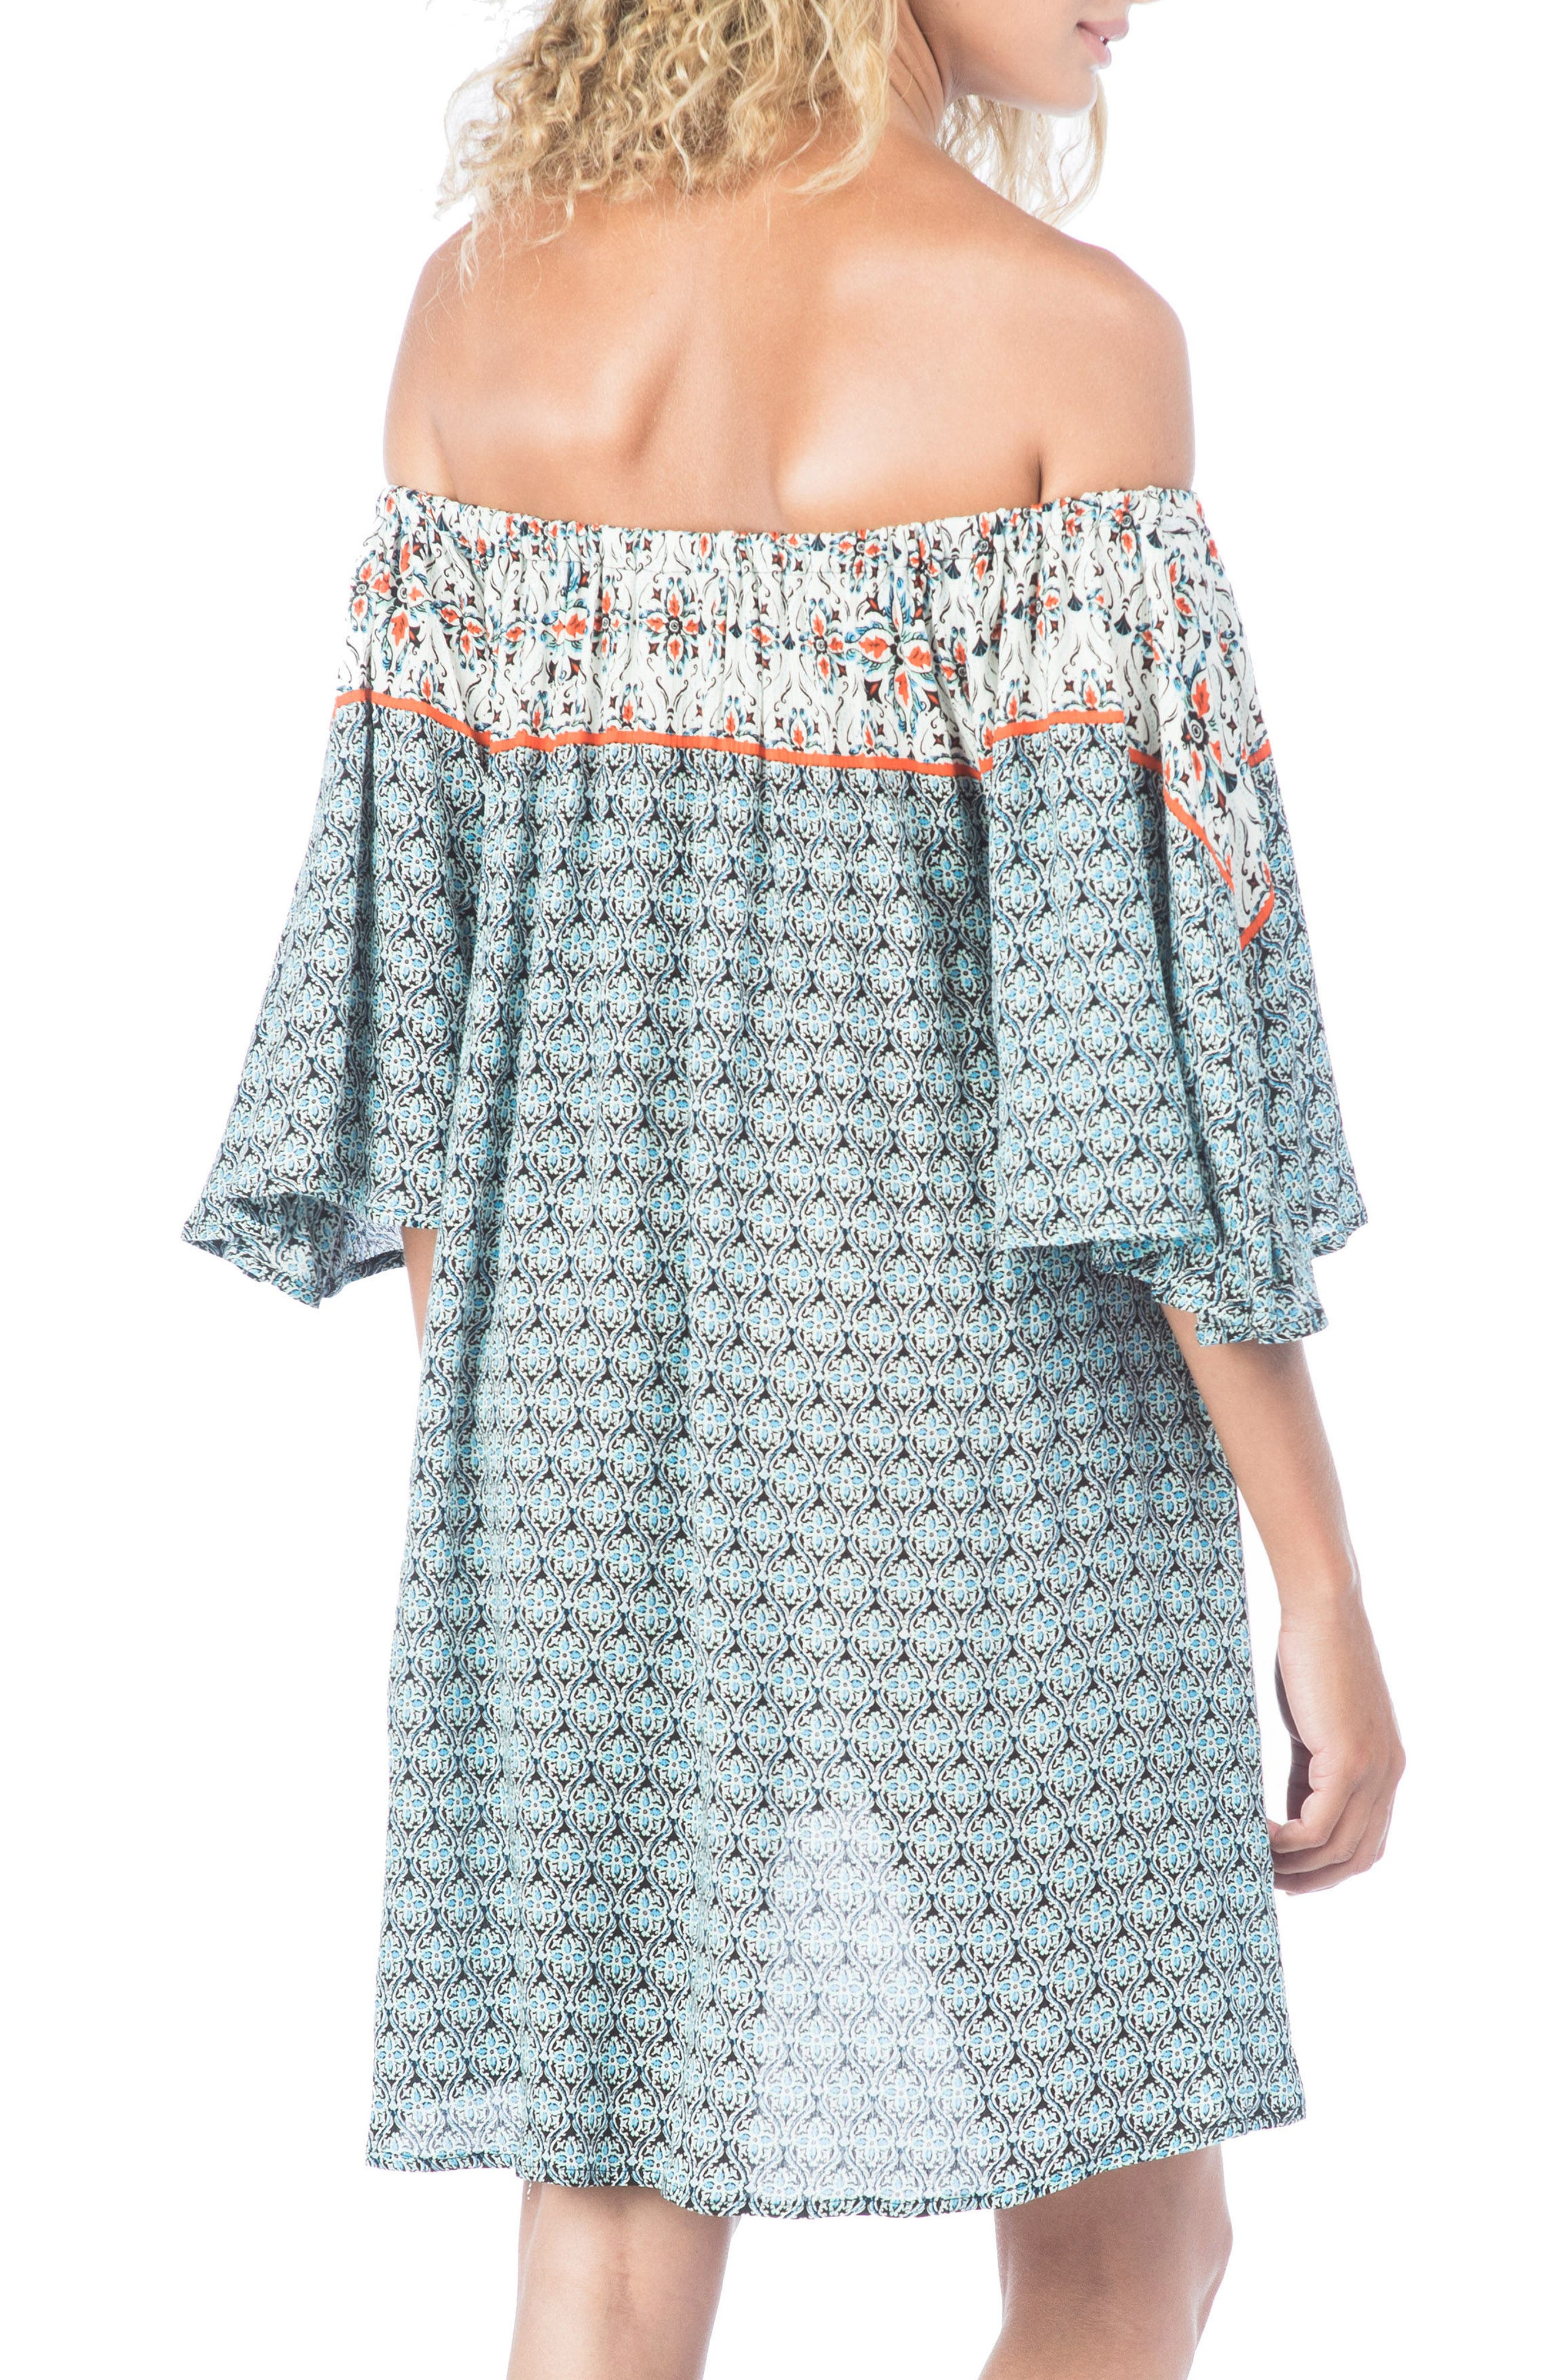 Monaco Tile Cover-Up Dress,                             Alternate thumbnail 2, color,                             002